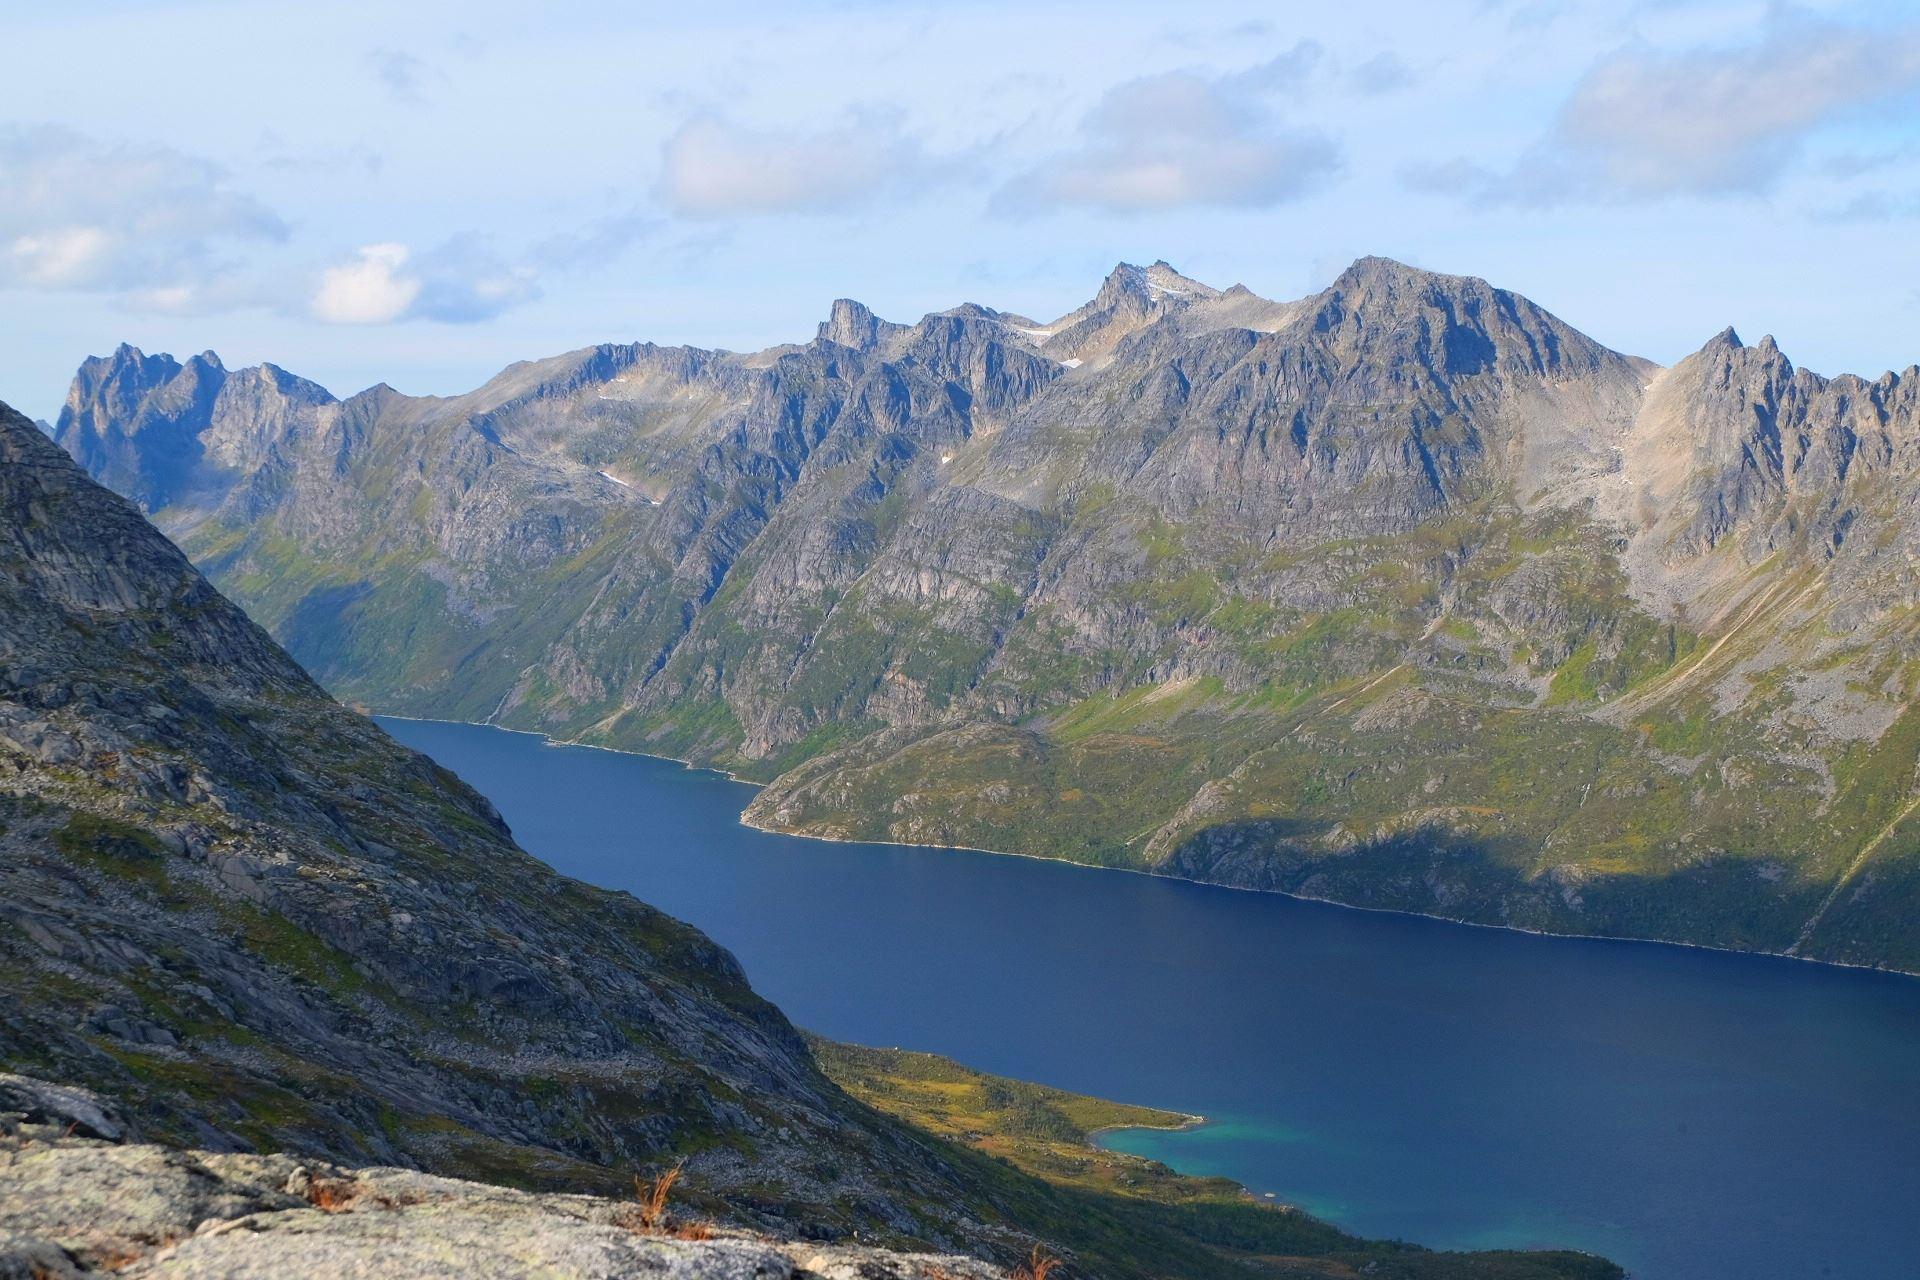 Nice hike – Great views! - The Green Adventure